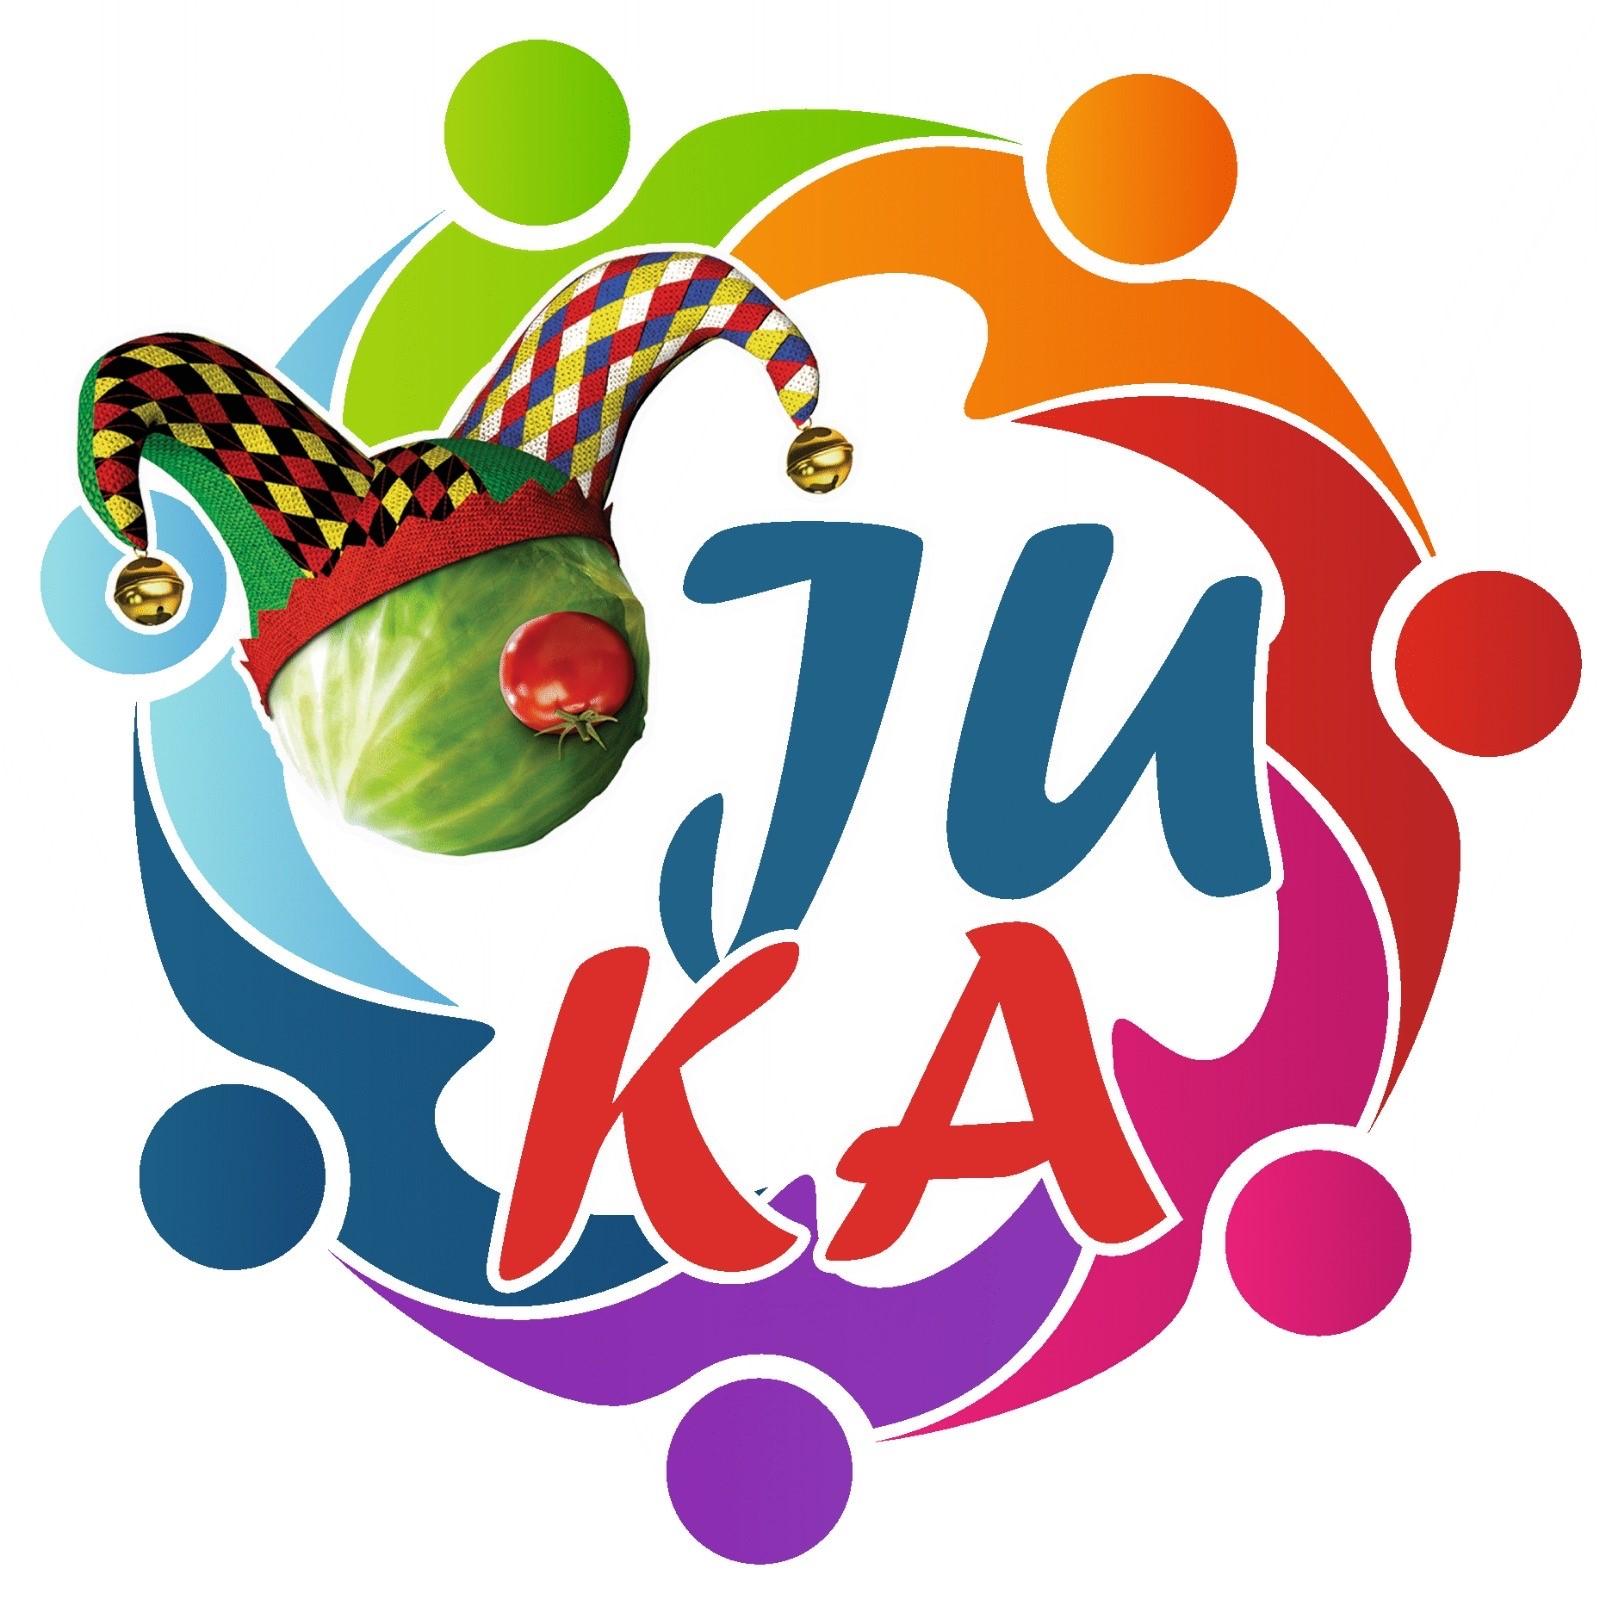 Logo JuKa Neuss